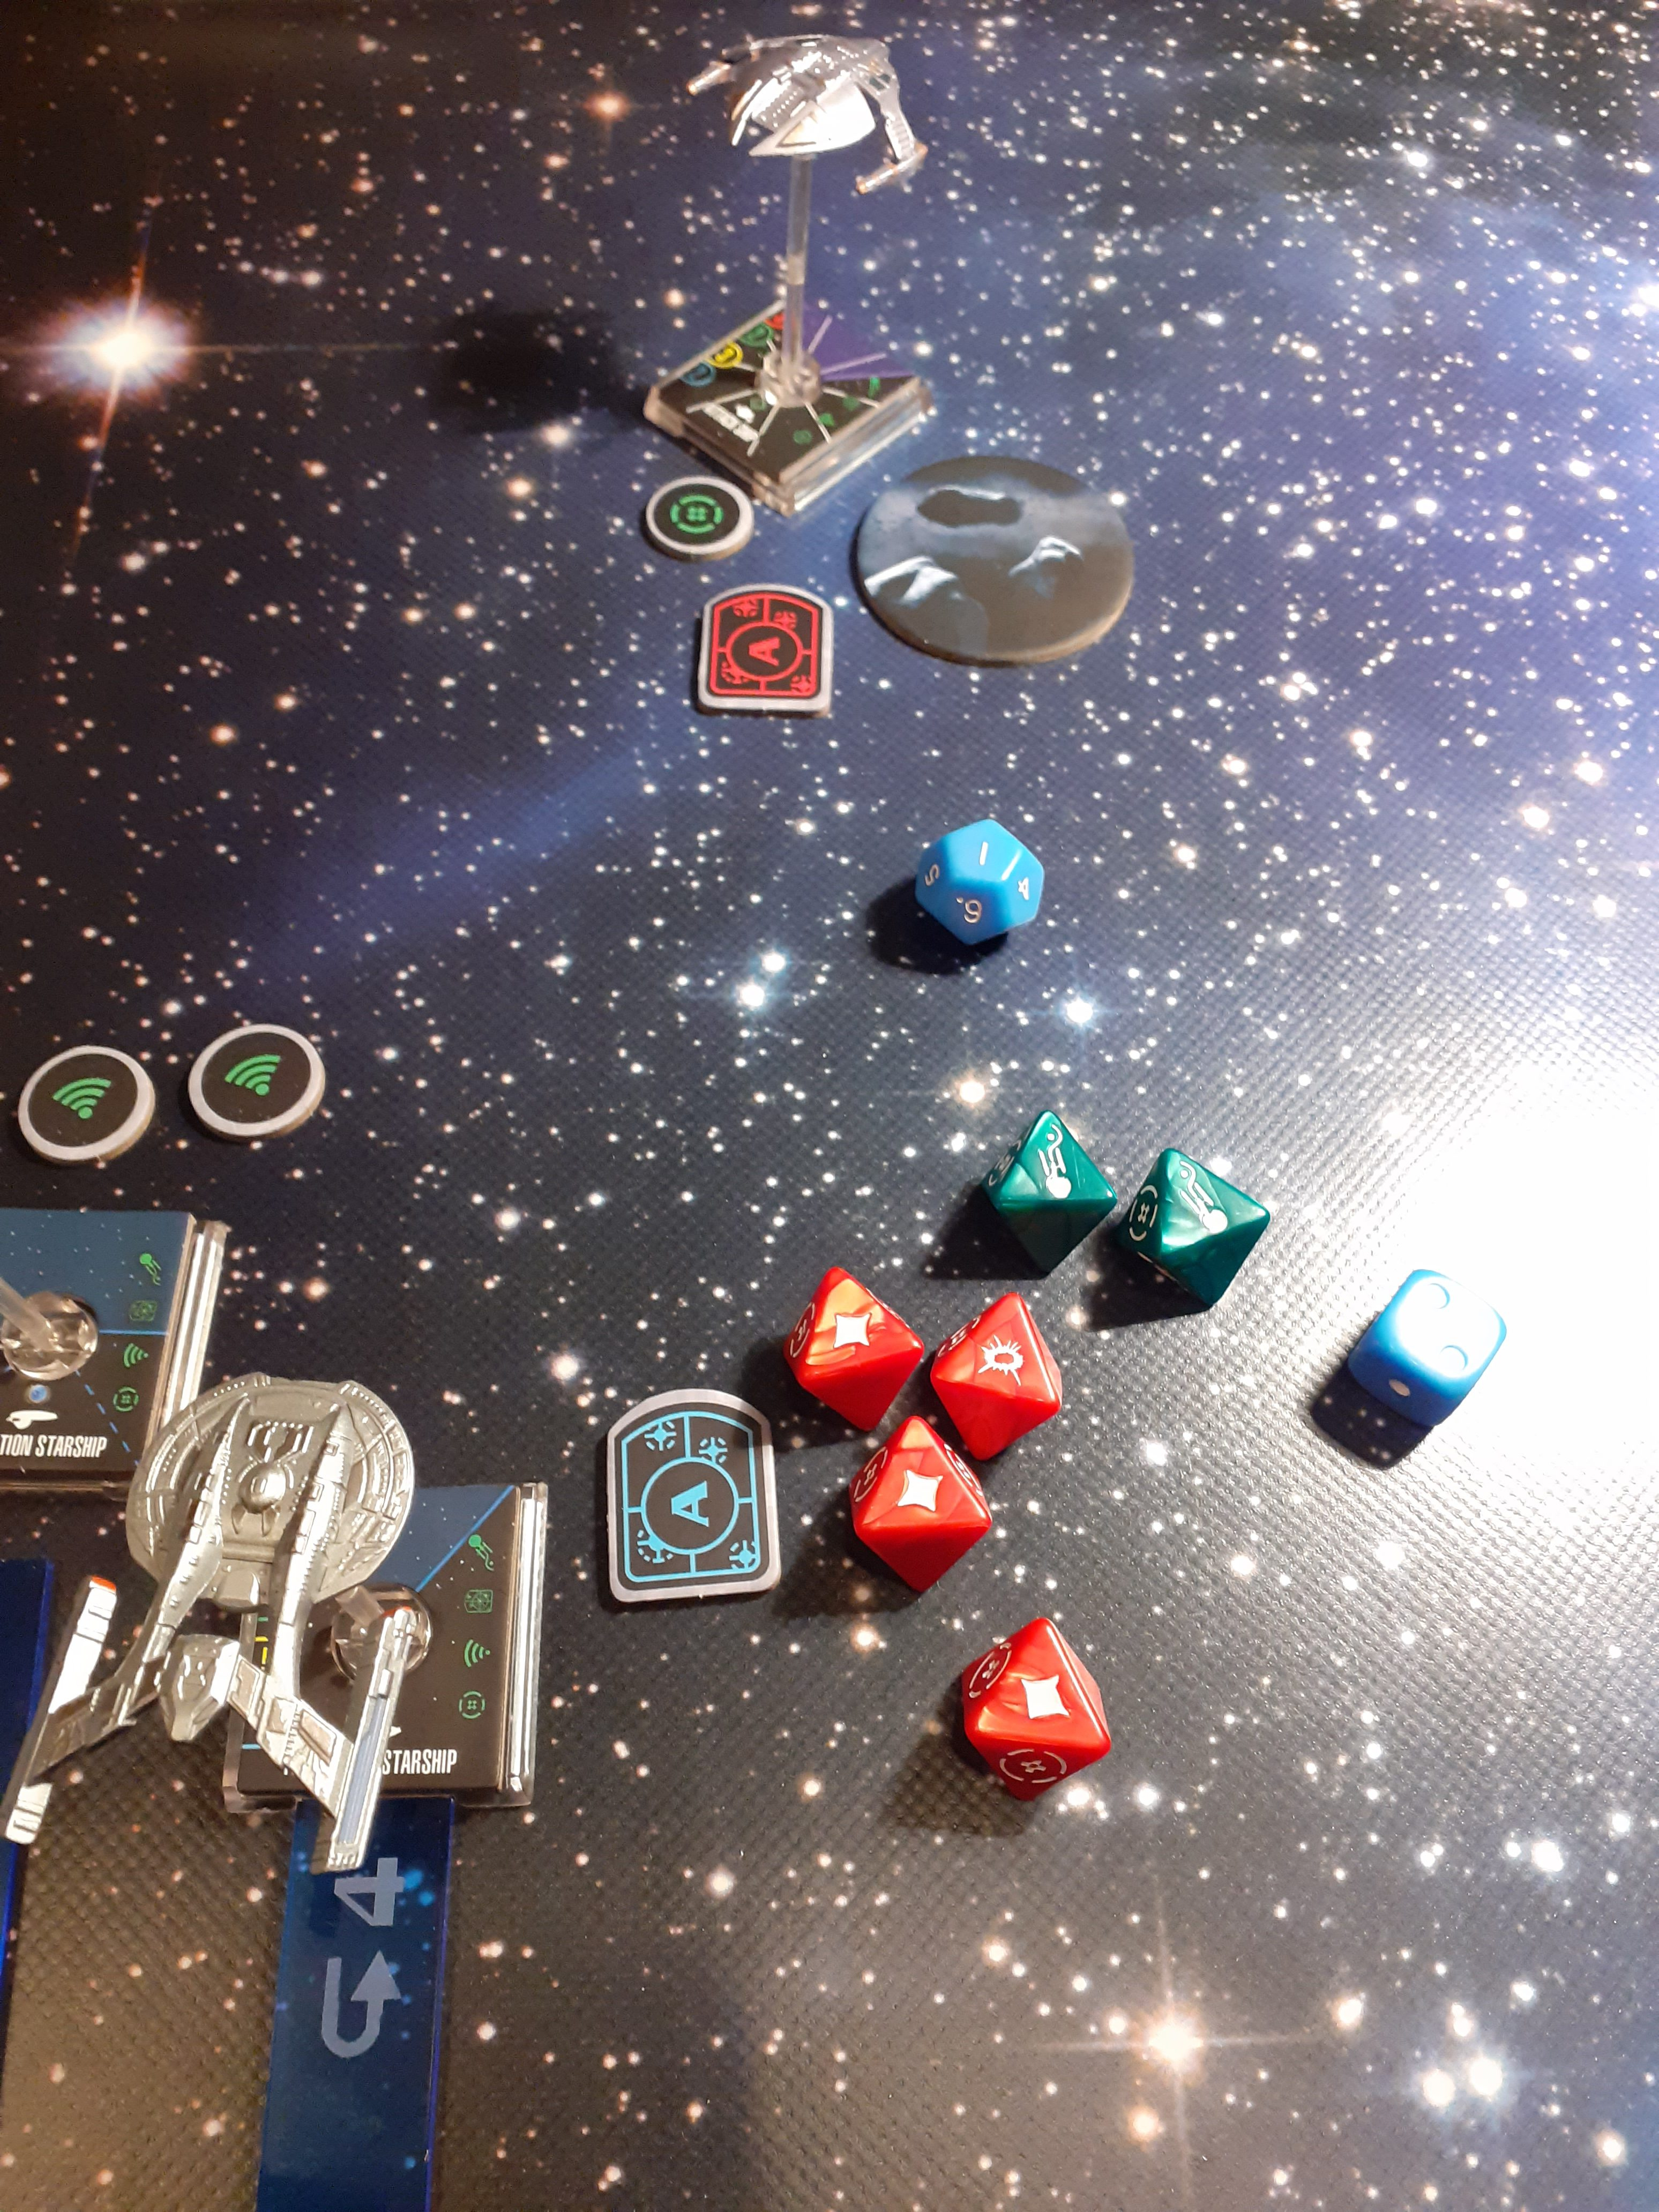 [Star Trek Alliance - Dominion War Campaign I] Computerlogbuch der Solo-Kampagne von Commander Cut  20210403_011933-e1617446259756